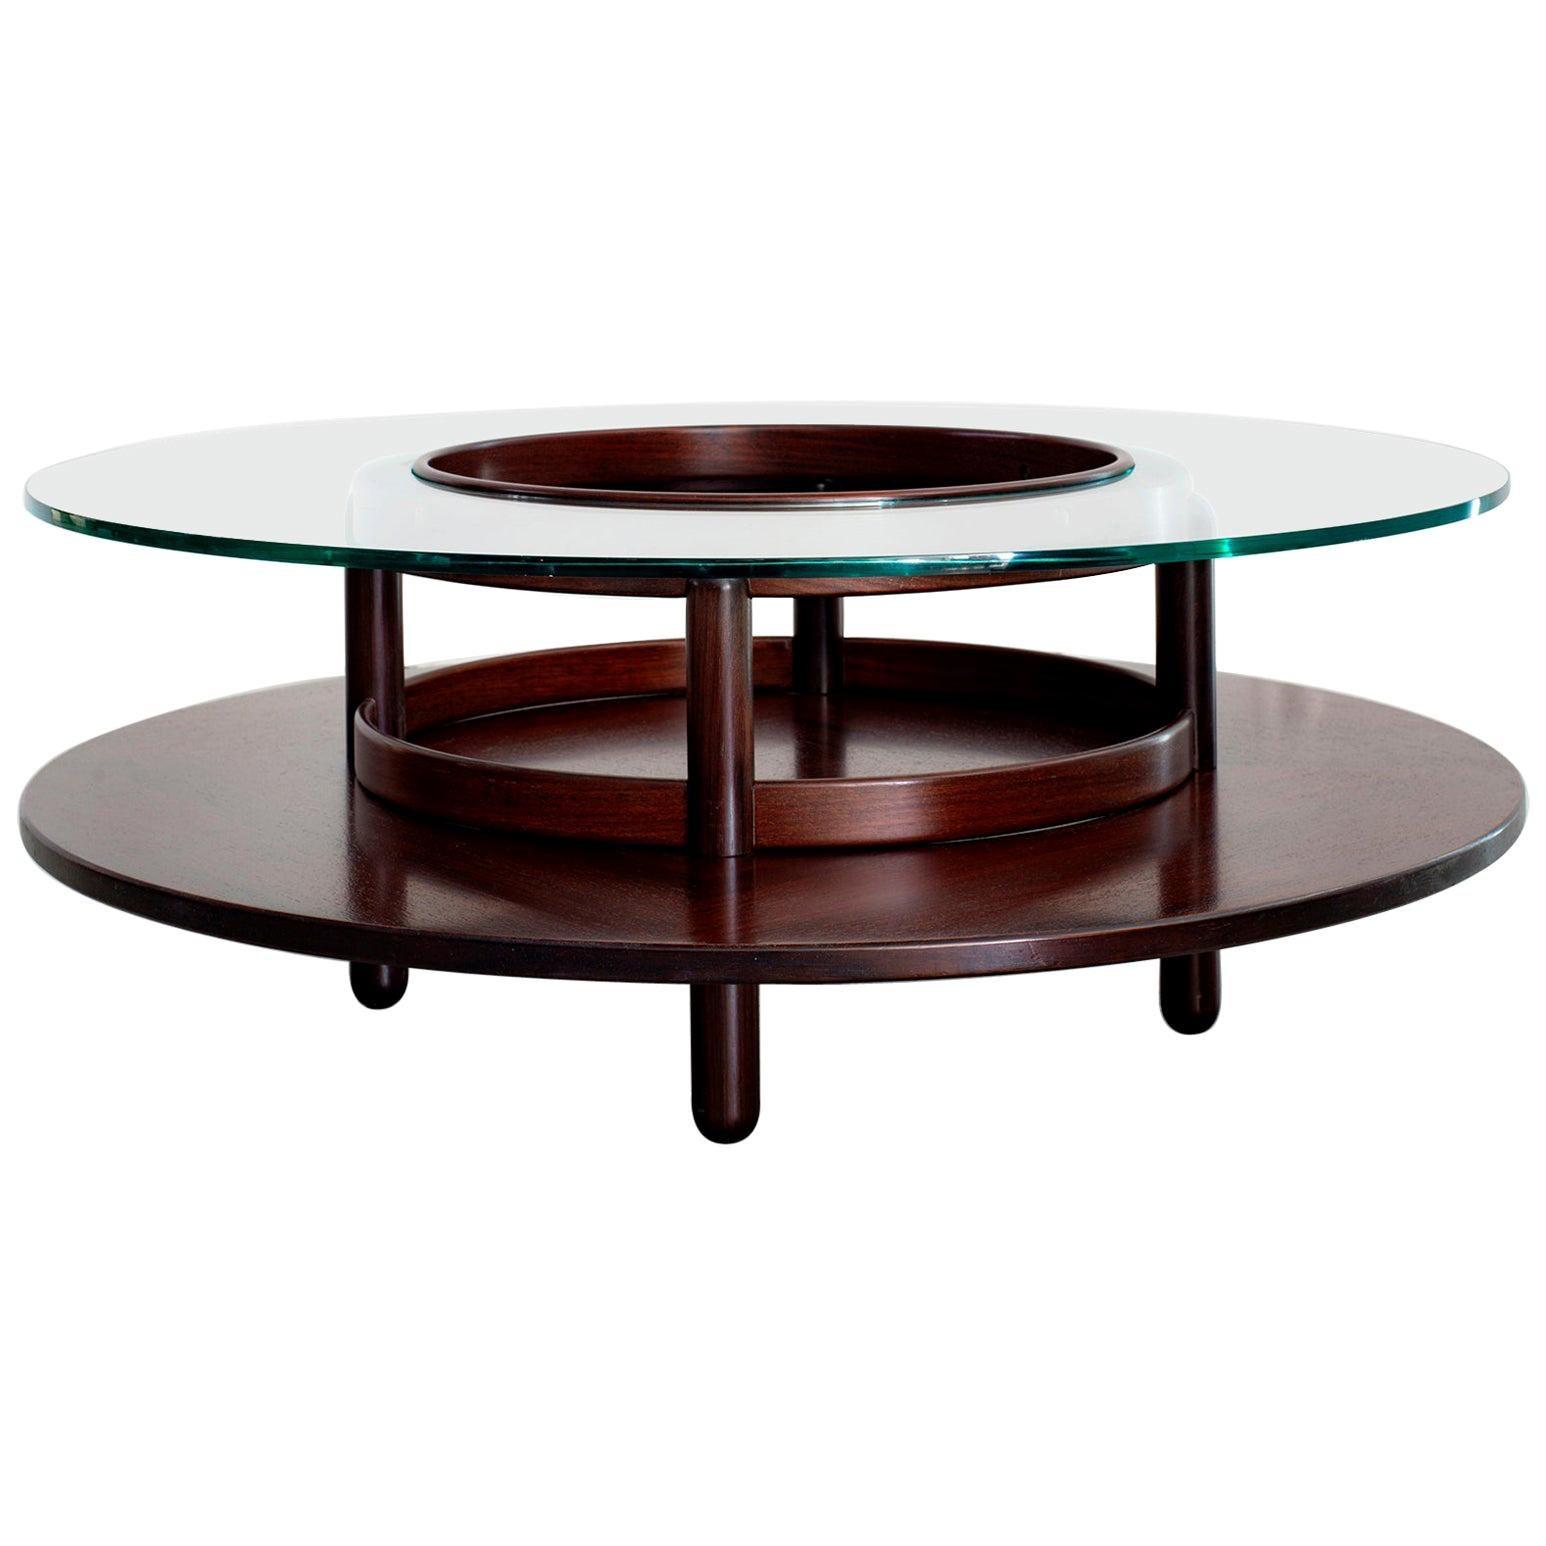 Gianfranco Frattini Attributed Coffee Table